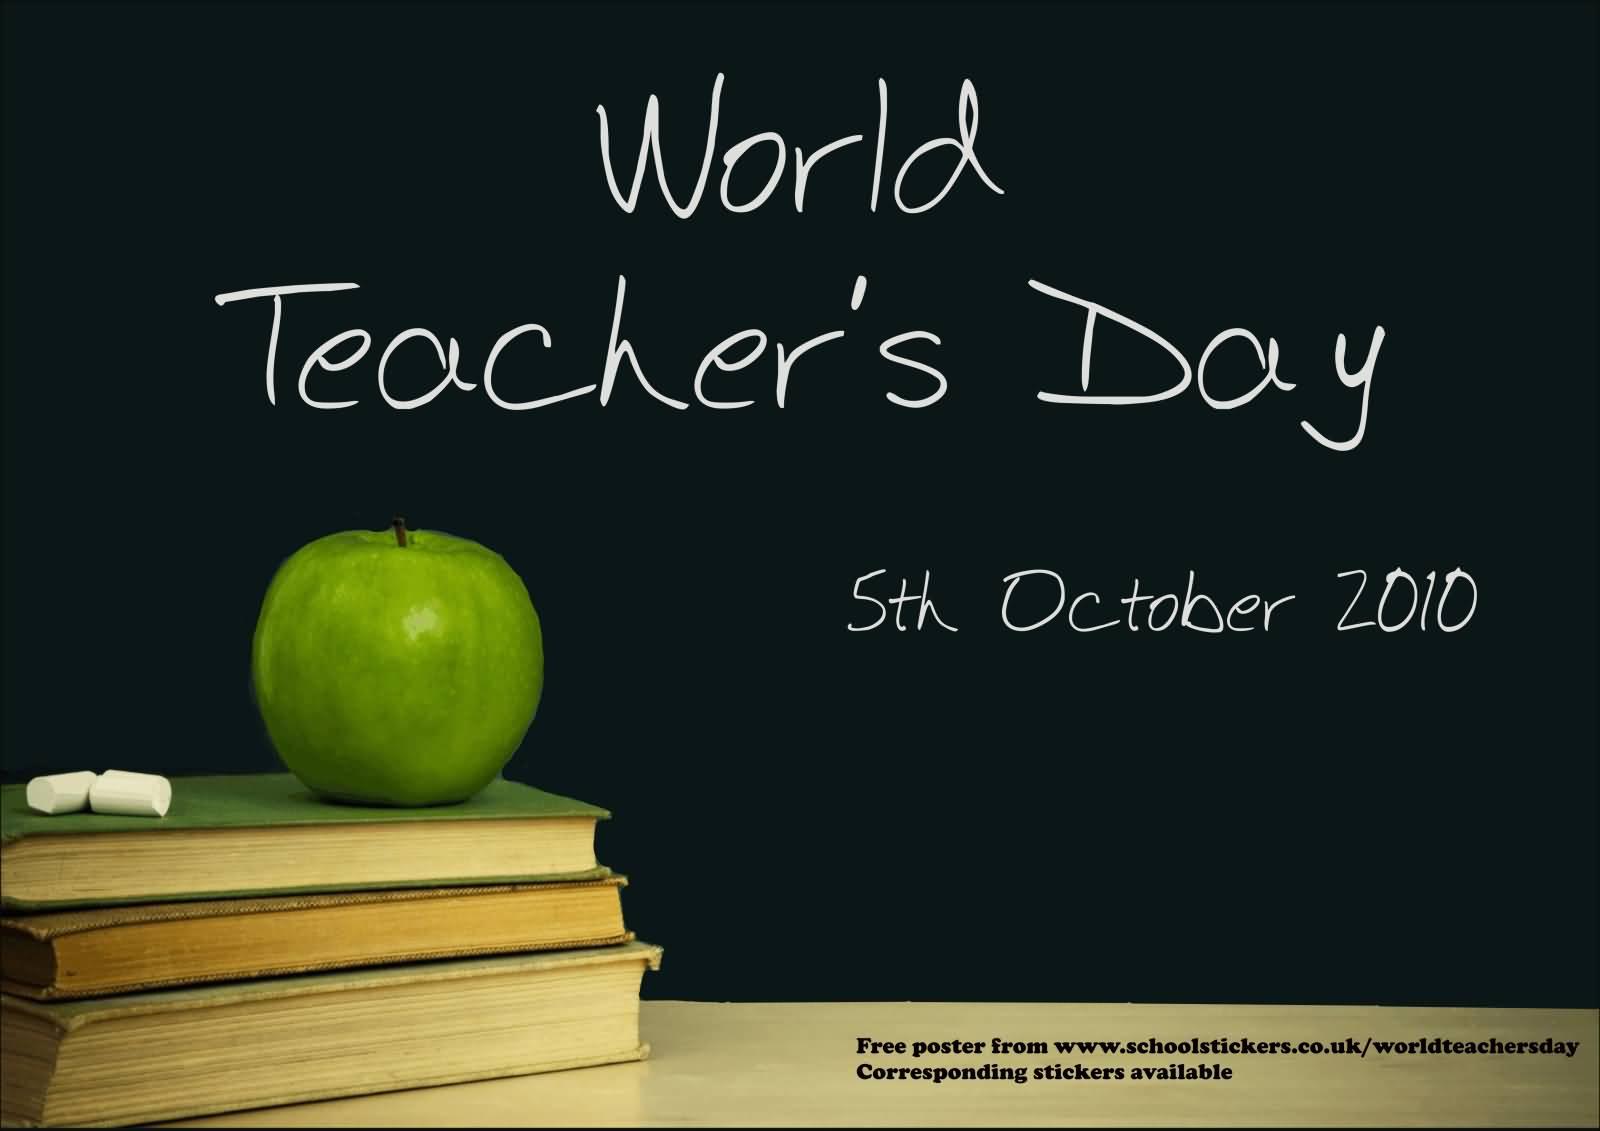 Best Wallpaper Happy World Teacher's Day Wishes Image